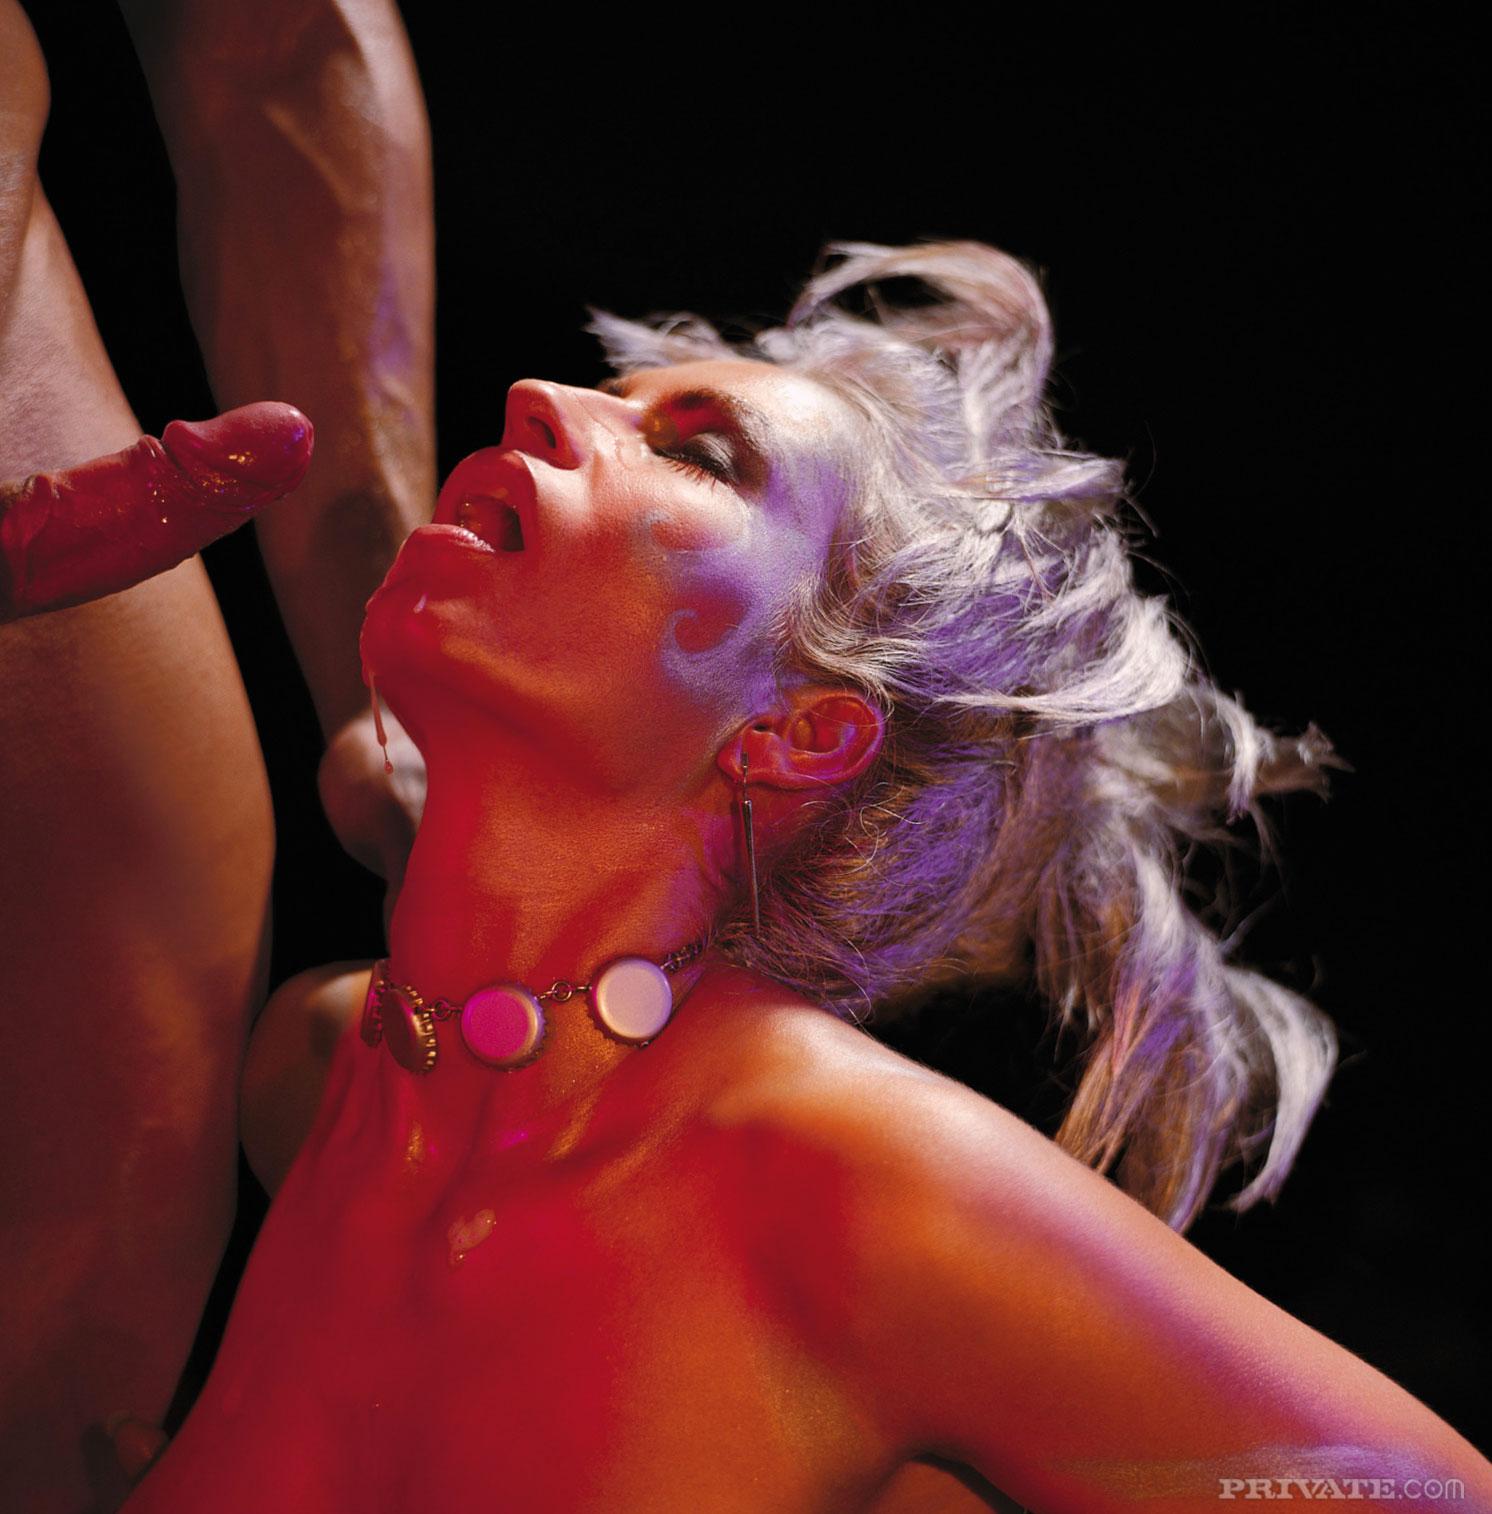 Naughty milf s nude pics